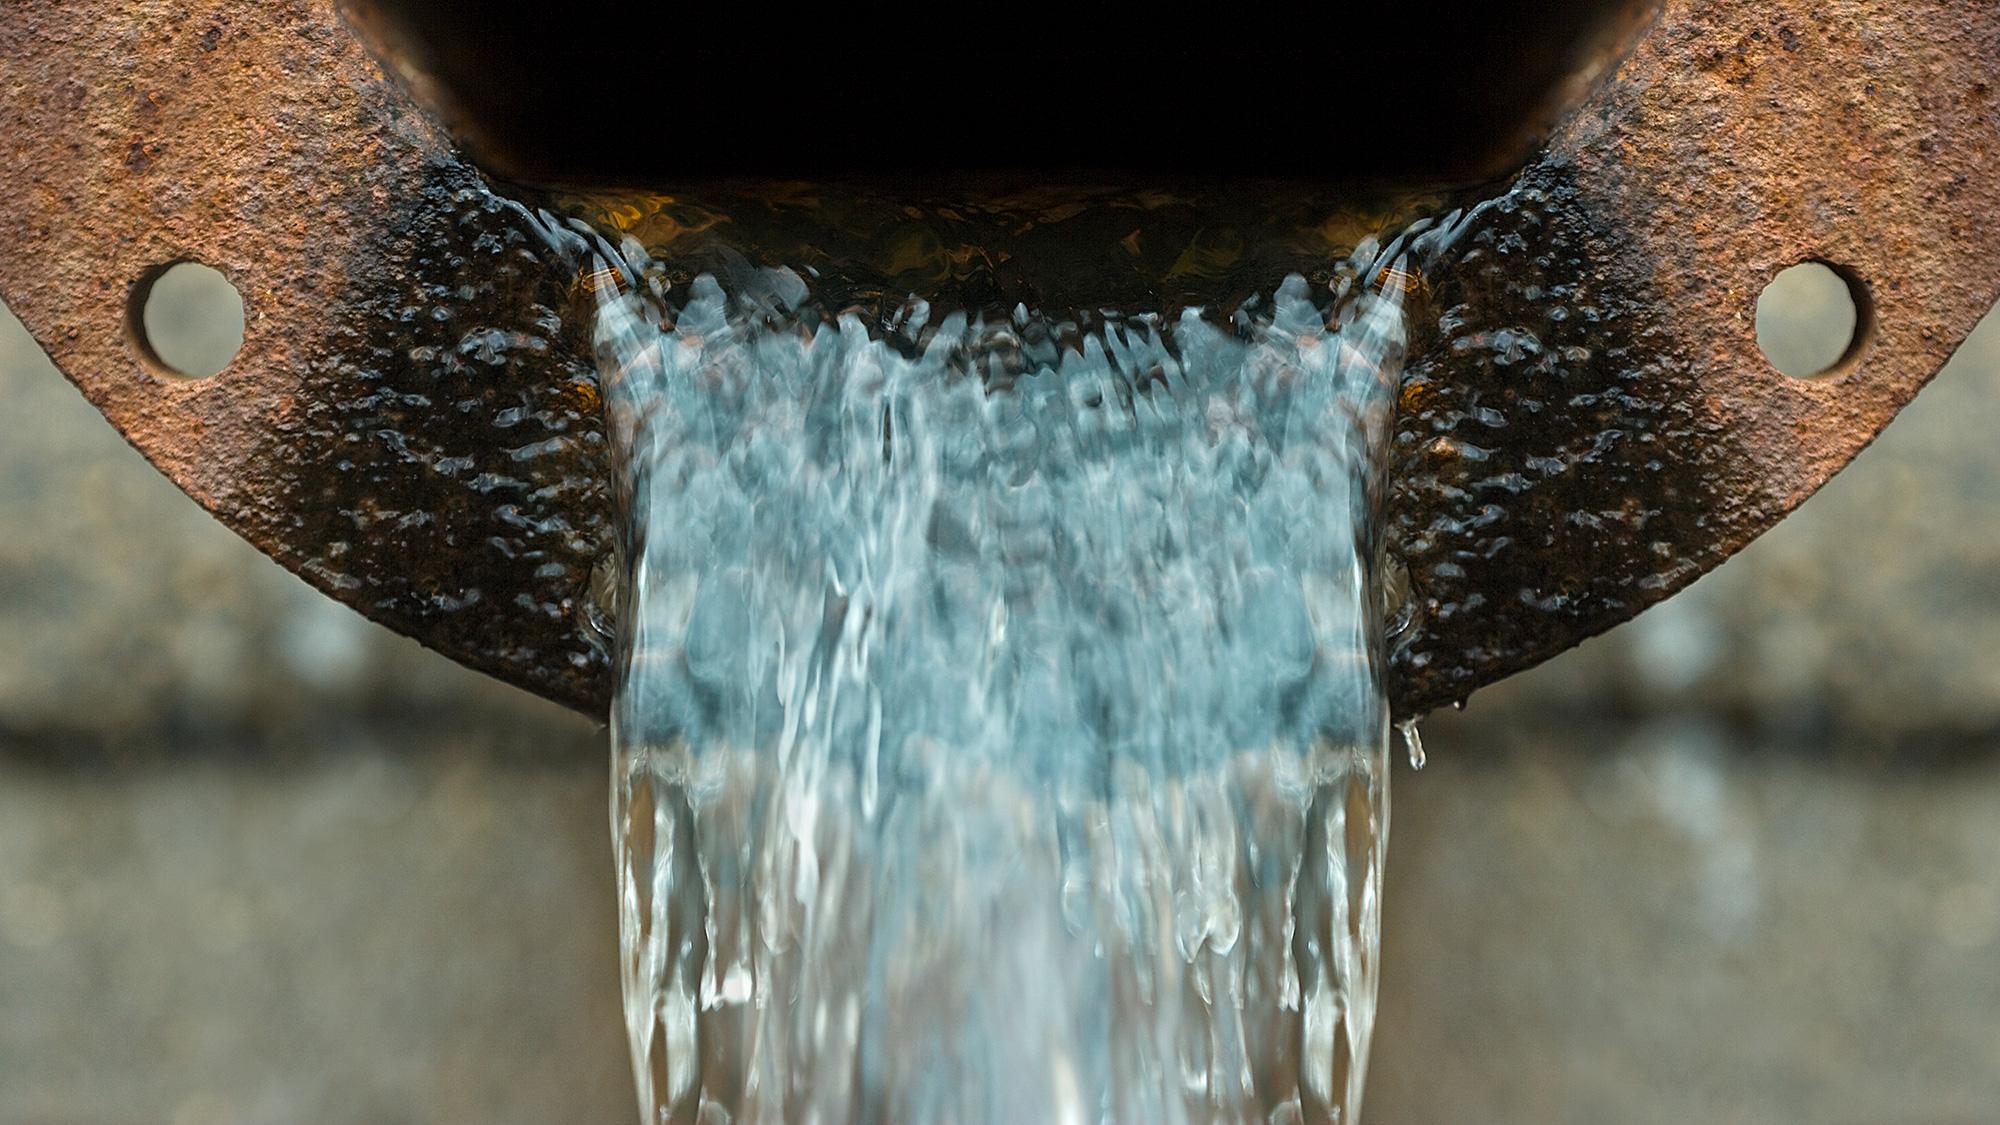 Drain flowing